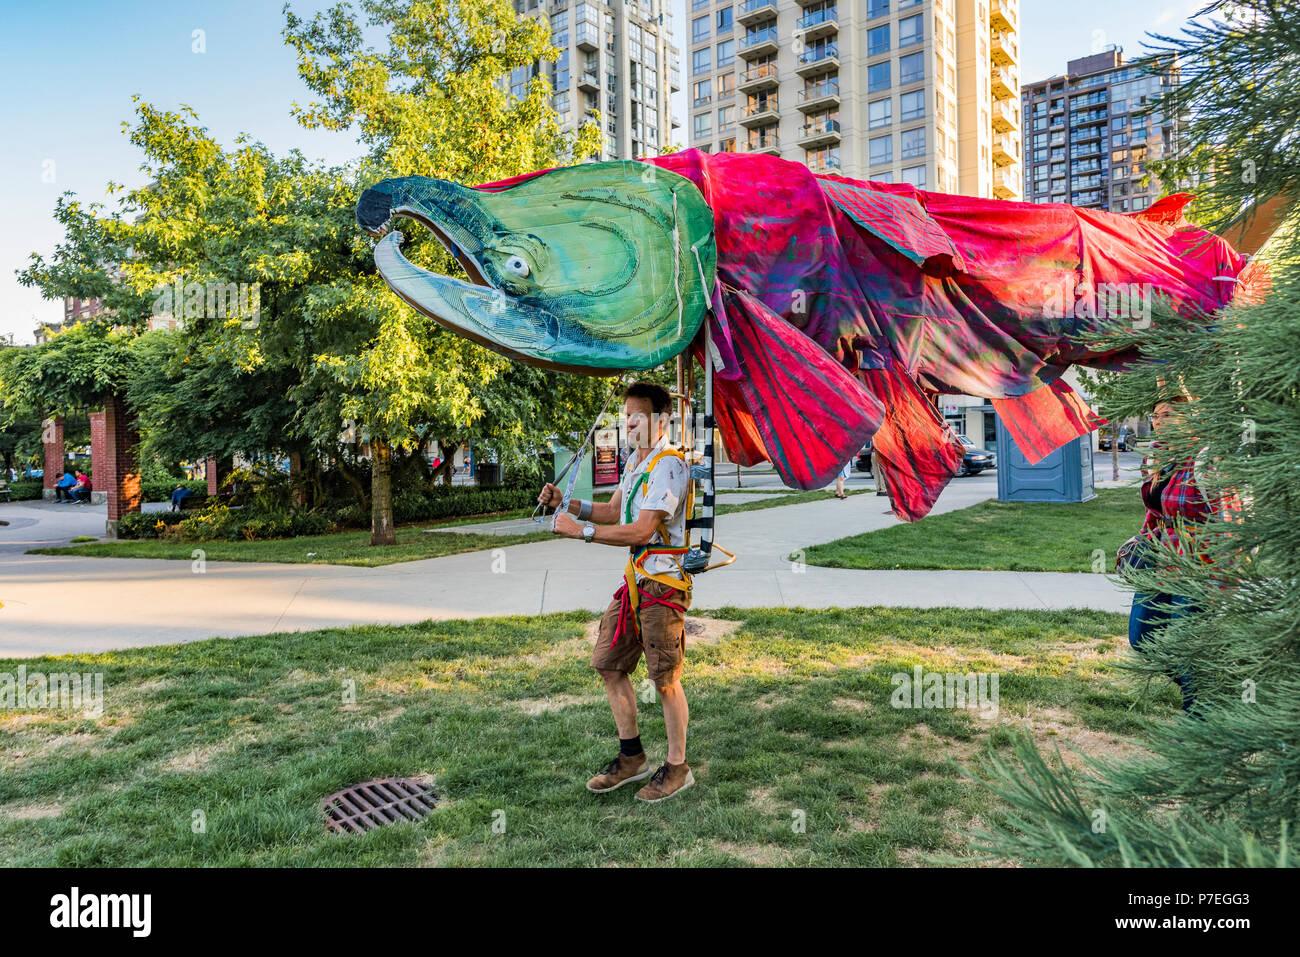 Sockeye Salmon puppet,  Gathering Festival, Summer Solstice Celebration, Vancouver, Emery Barnes Park, British Columbia, Canada. - Stock Image